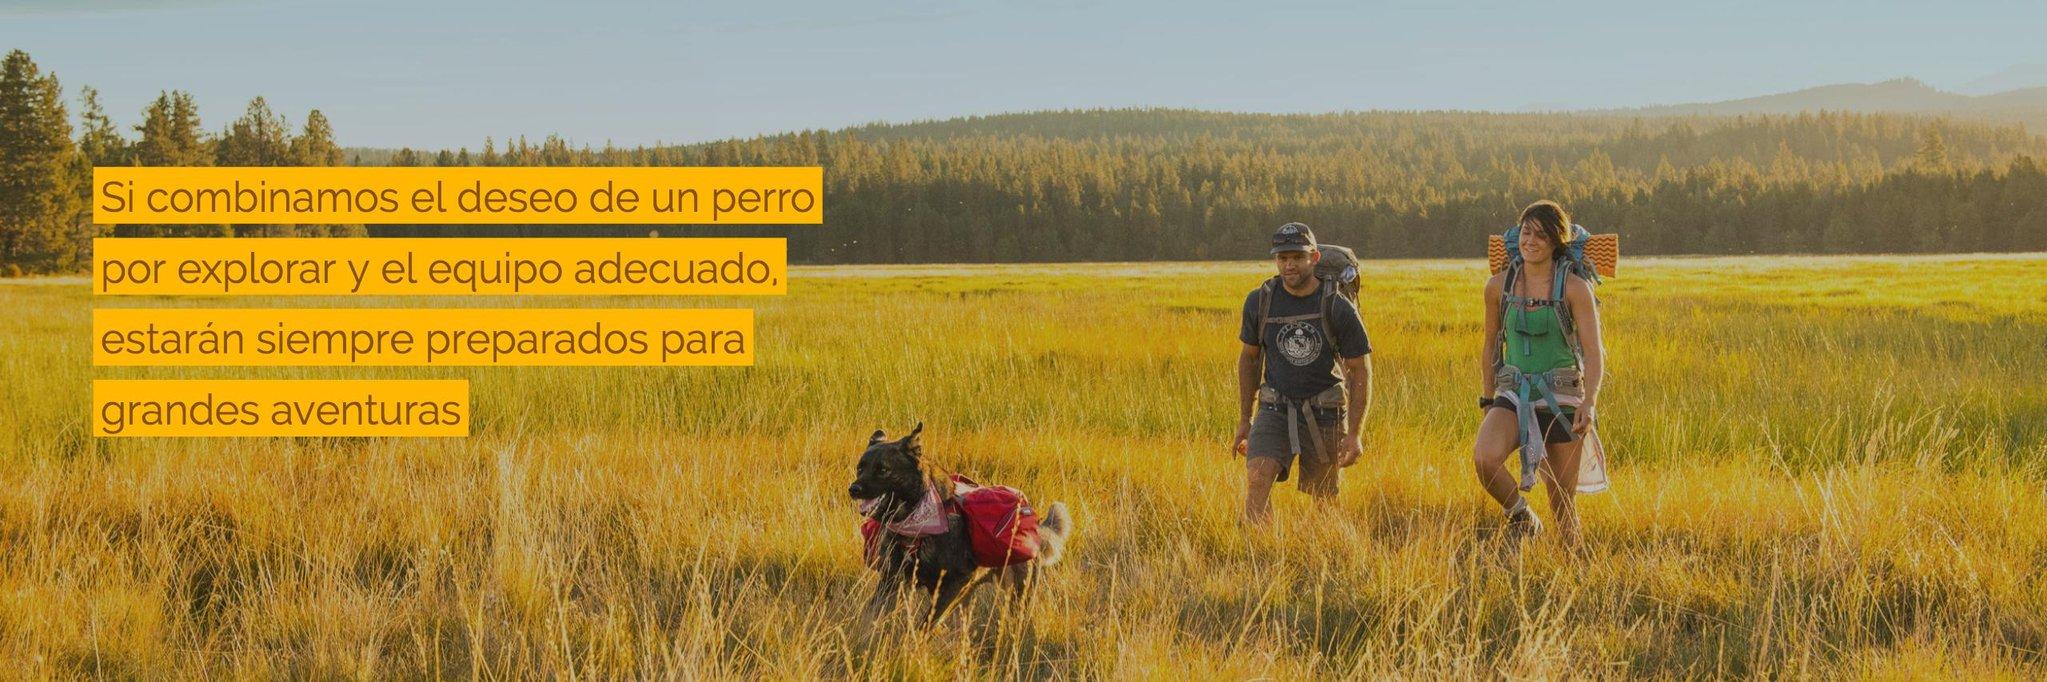 Ruffwear Blog para RealProperty Chile - Productos en Amazon.jpg